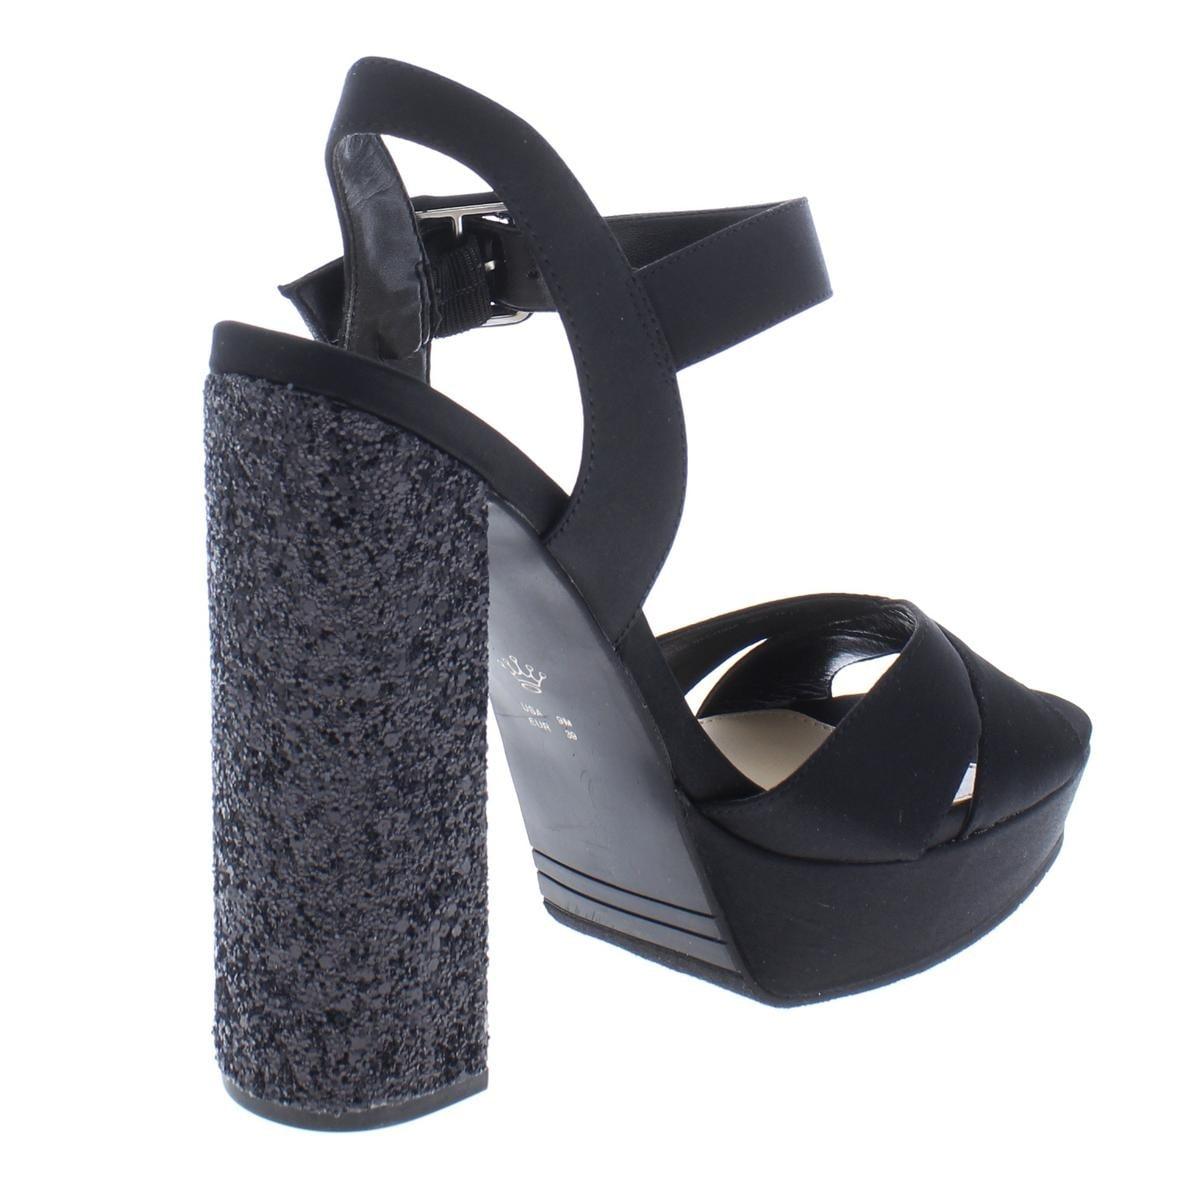 5457698f4f Shop Nina Womens Savita Platform Sandals Satin Glitter - Free Shipping On  Orders Over $45 - Overstock - 24206248